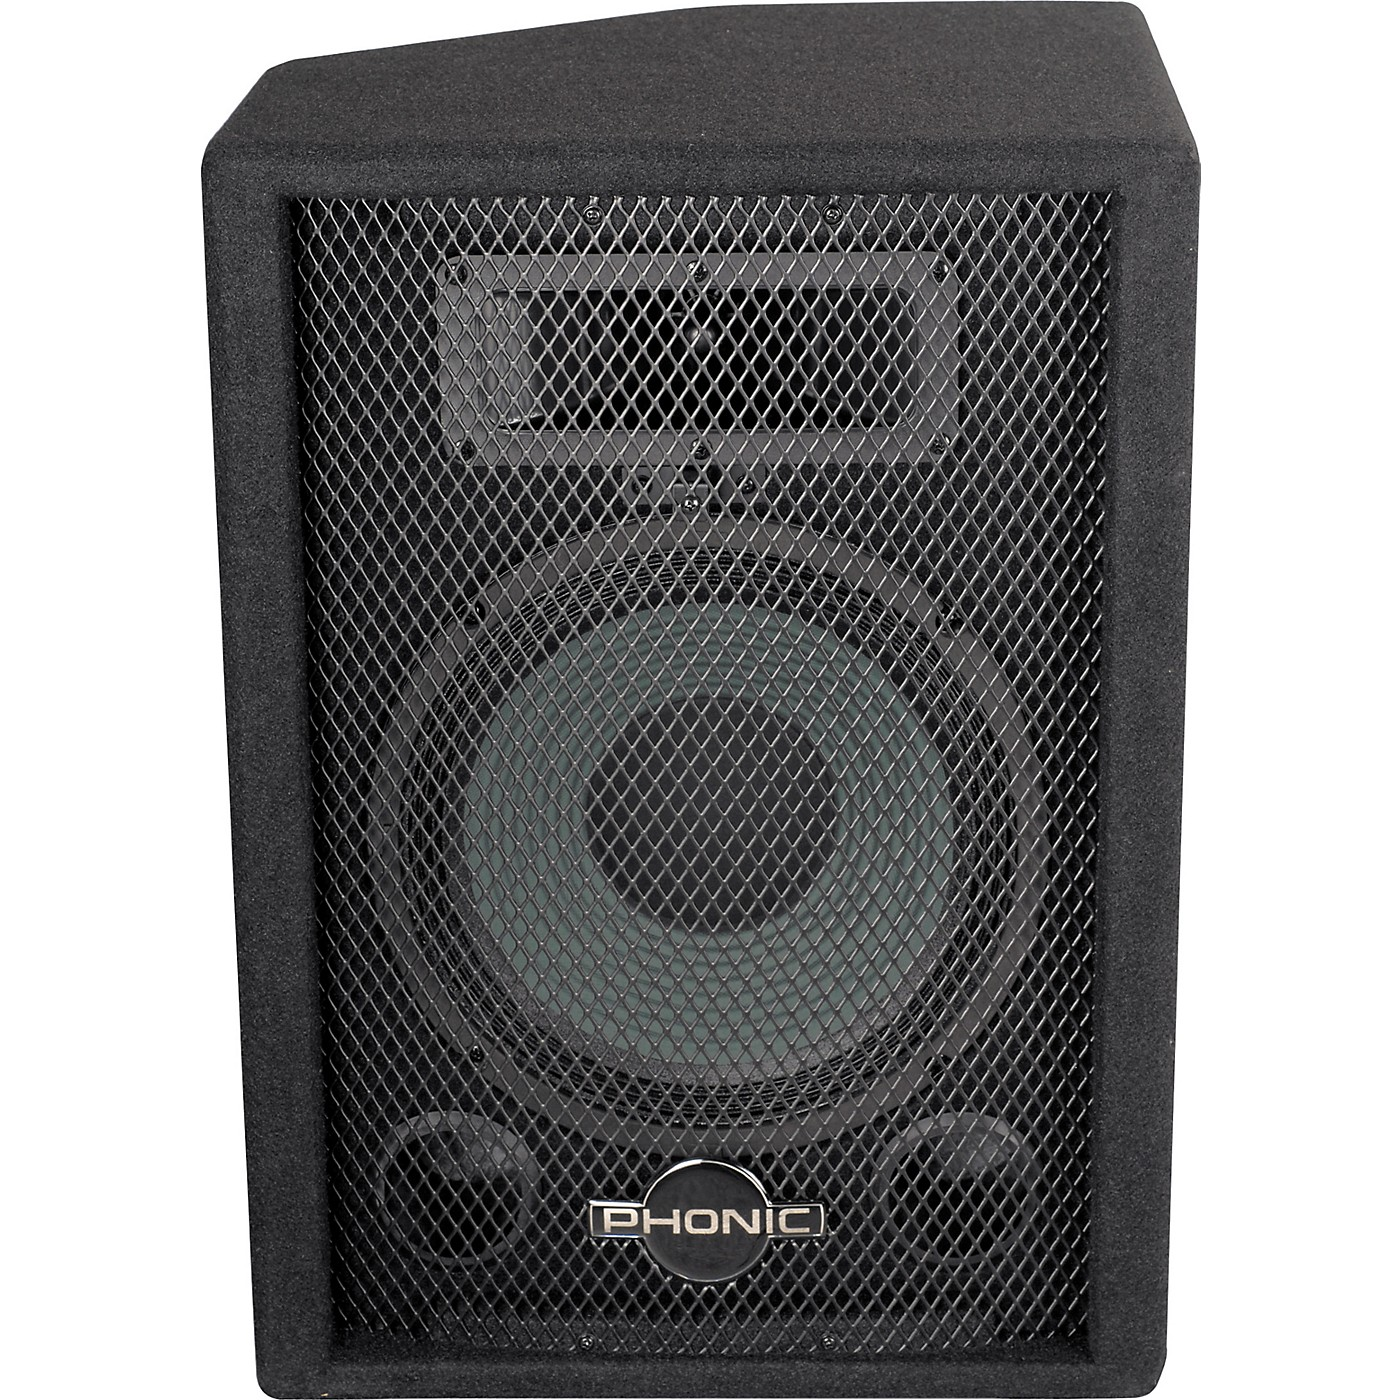 Phonic S710 10 in. 2-Way Speaker thumbnail